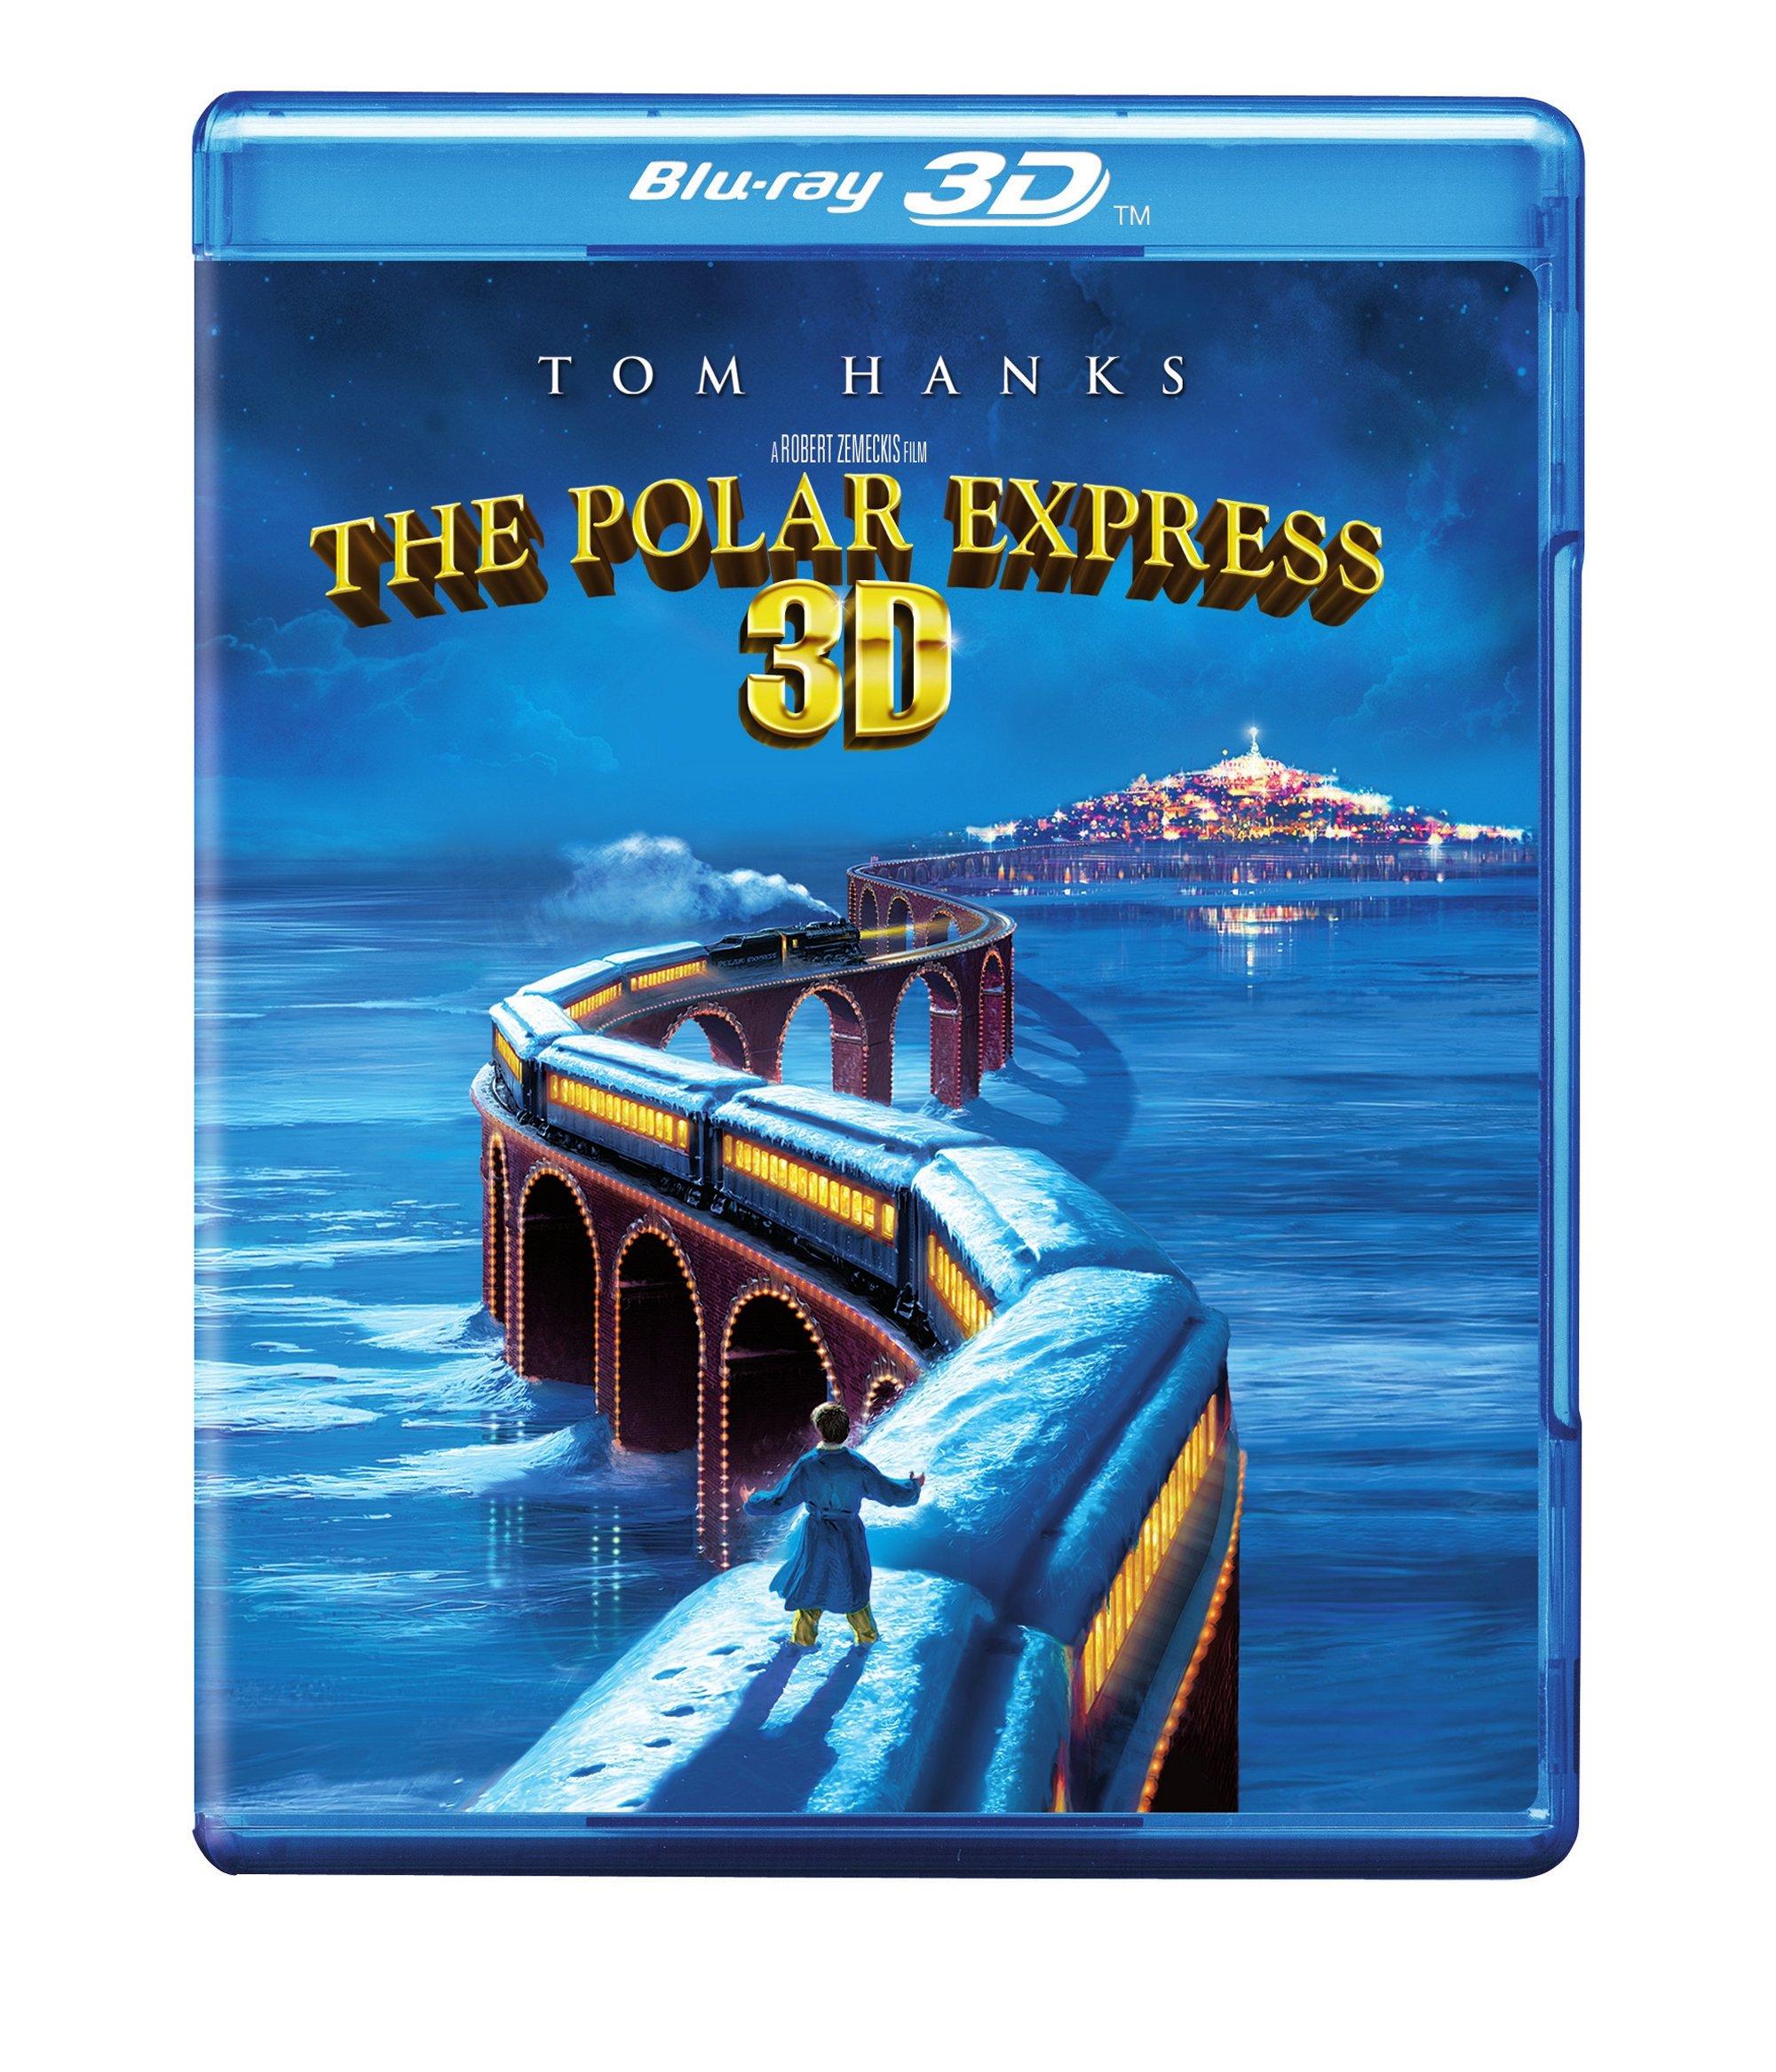 The Polar Express (Single Disc Blu-ray 3D/Blu-ray Combo)  $6.99 @Amazon